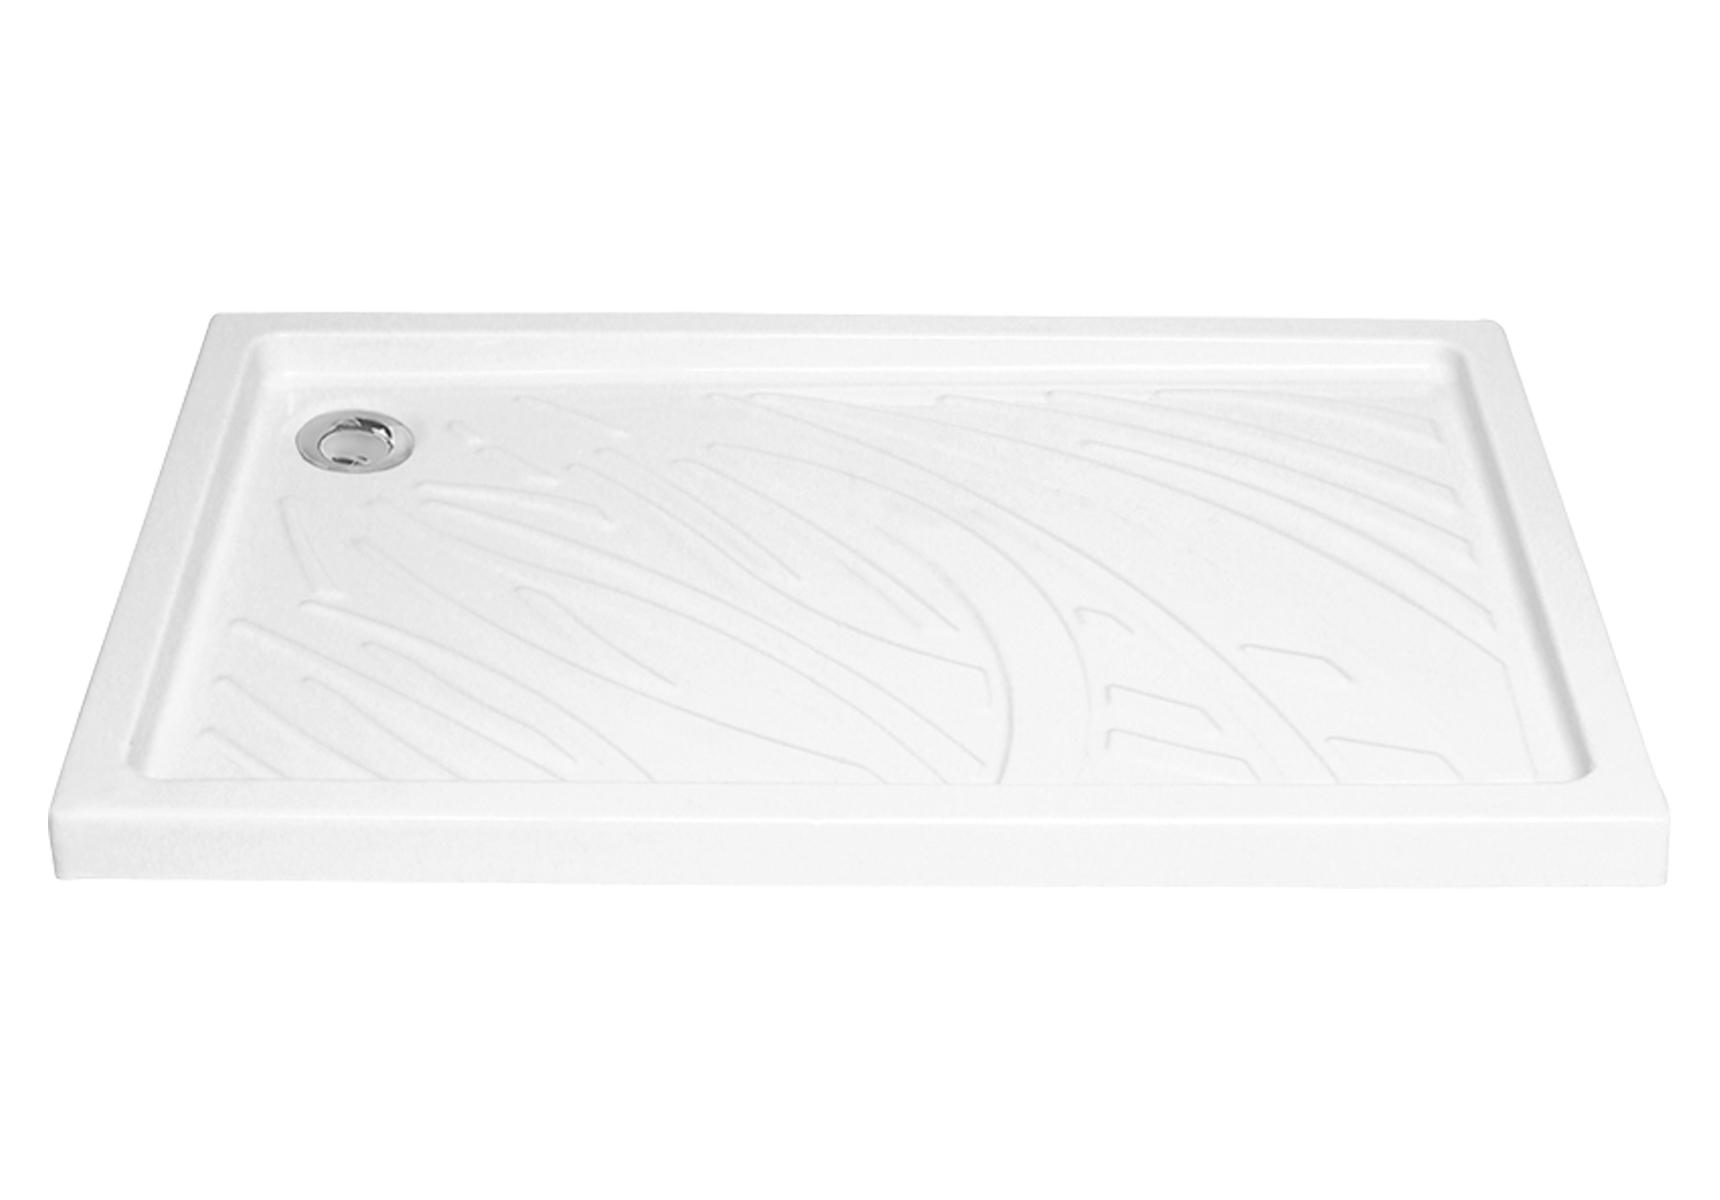 Arkitekt receveur à encastrer ou à poser fond extra plat, 120  x  80 cm, blanc